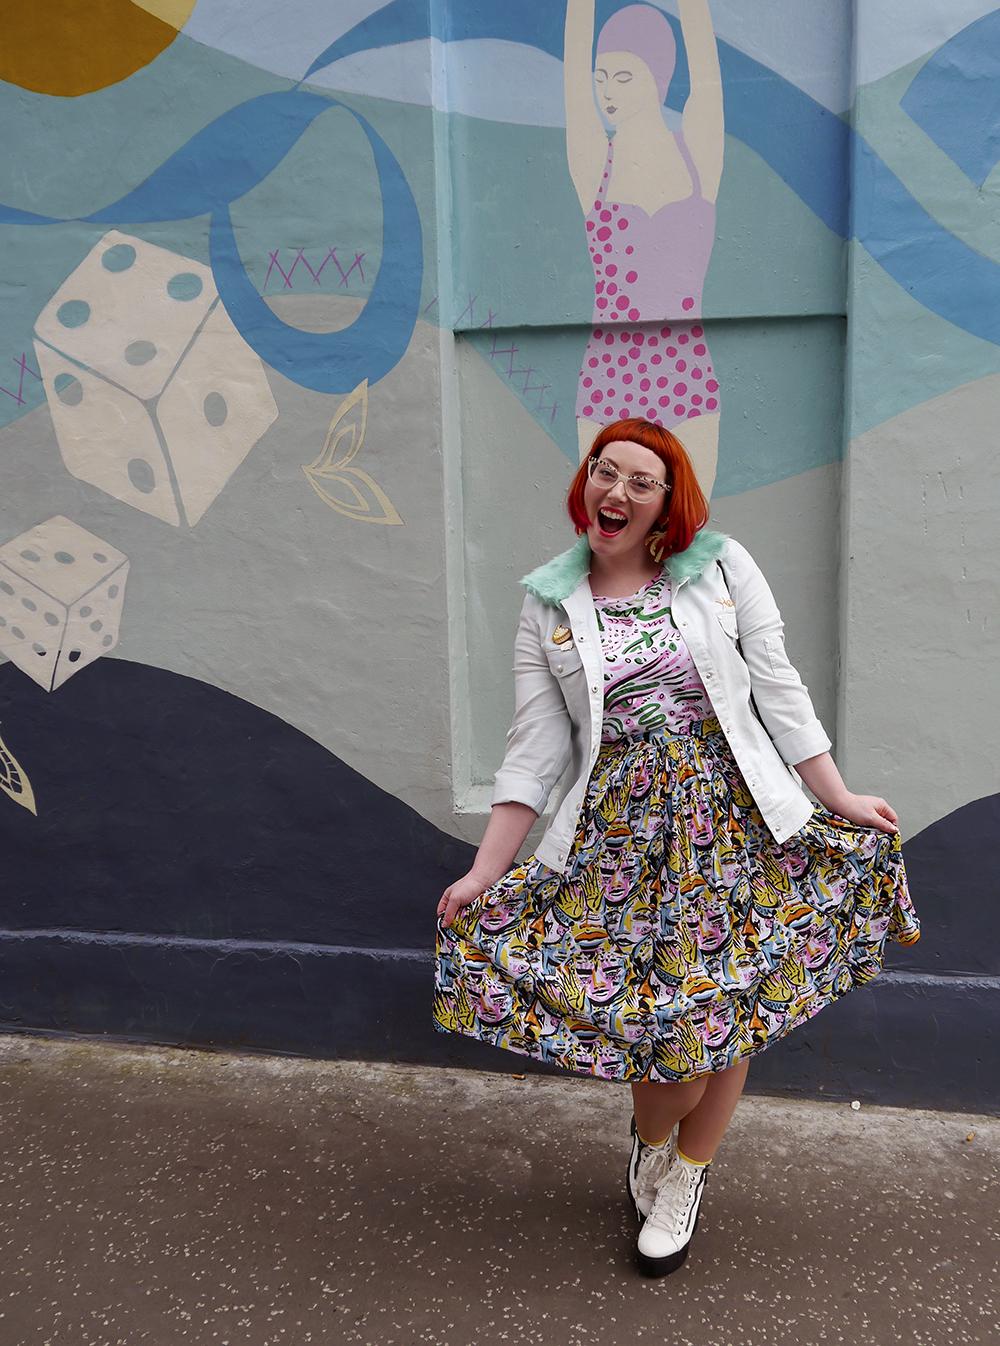 Styled by Helen, Wardrobe Conversations, Scottish Blogger, Edinburgh Blogger, Dundee Blogger, red head, ginger bob, Spex Pistols glasses, leopard print glasses, customised denim jacket, mint fur collar, Monki prints, Monki tshirt, Monki x Lynnie Zulu, Lynnie Zulu for Monki, River Island white lace up shoes, Rockcakes brooch, Rock Cakes pin badges, personalised denim jacket, Lucky Dip pins, milkshake with sprinkles, Roller Shakes, Blog Birthday, Style Diner, Kate George Mural Edinburgh, wall art Edinburgh, Edinburgh South side, Lou Taylor, tropical earrings, skinny dip london milk bag, novelty bag, milk bag